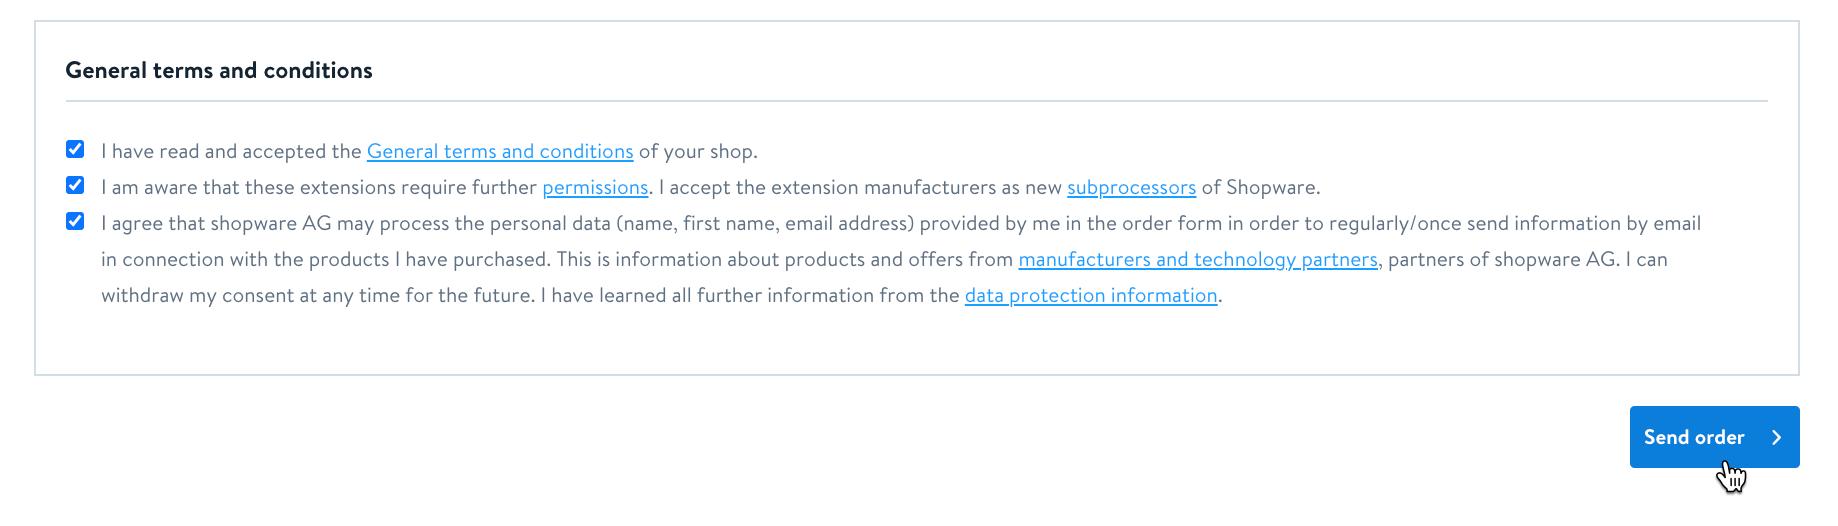 Cursor clicks - Send order - Shopware 6